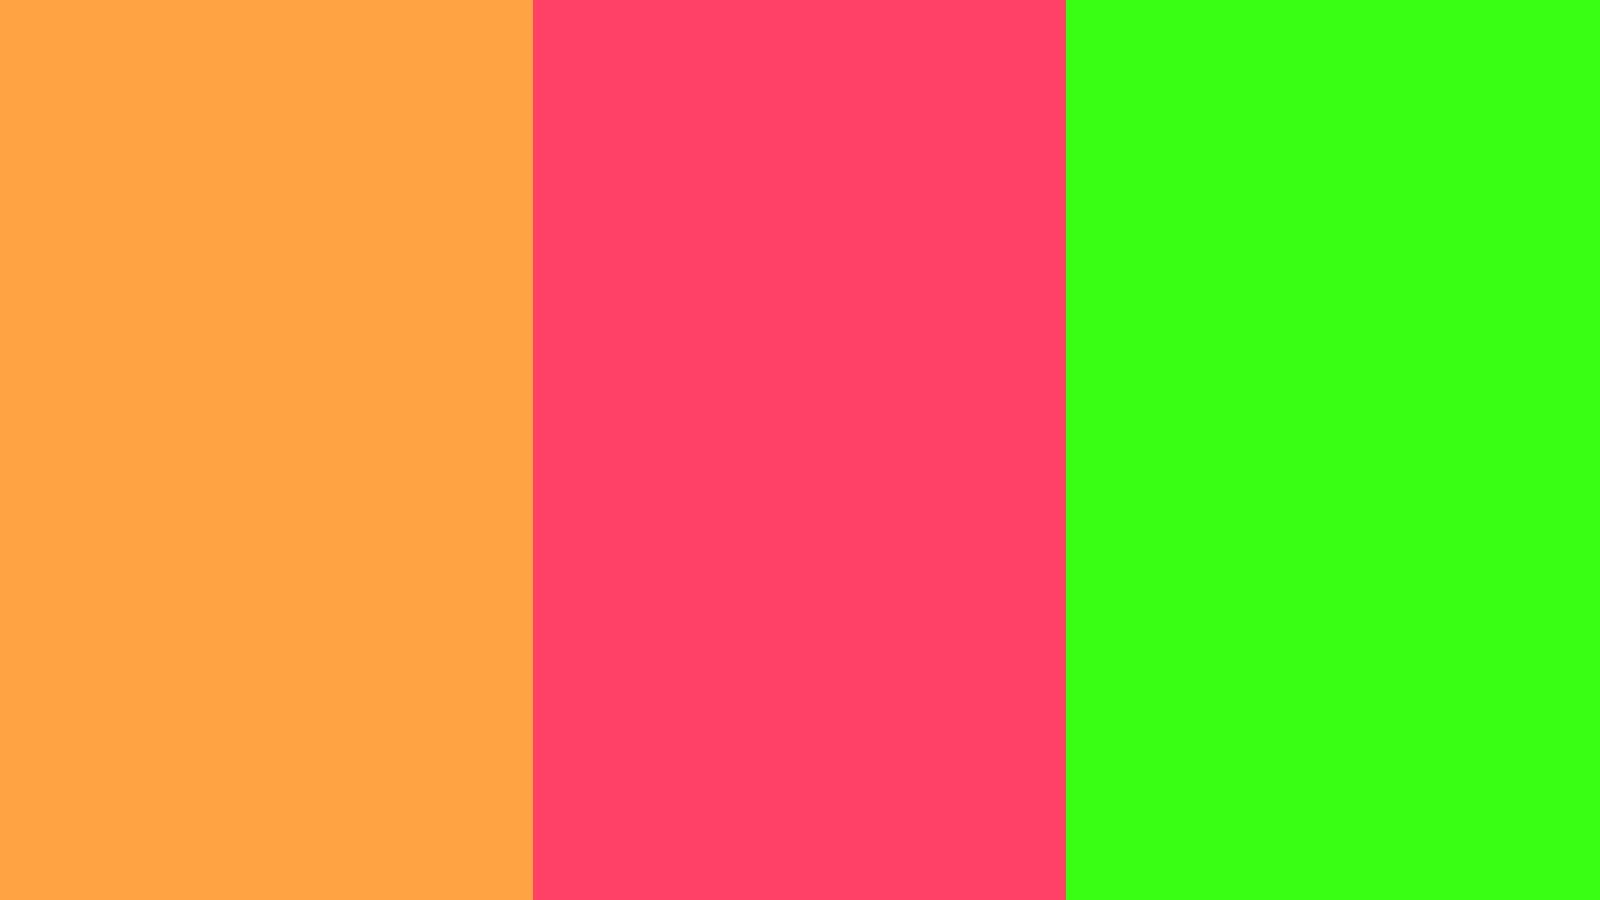 neon carrot neon fuchsia neon green three color backgroundjpg 1600x900